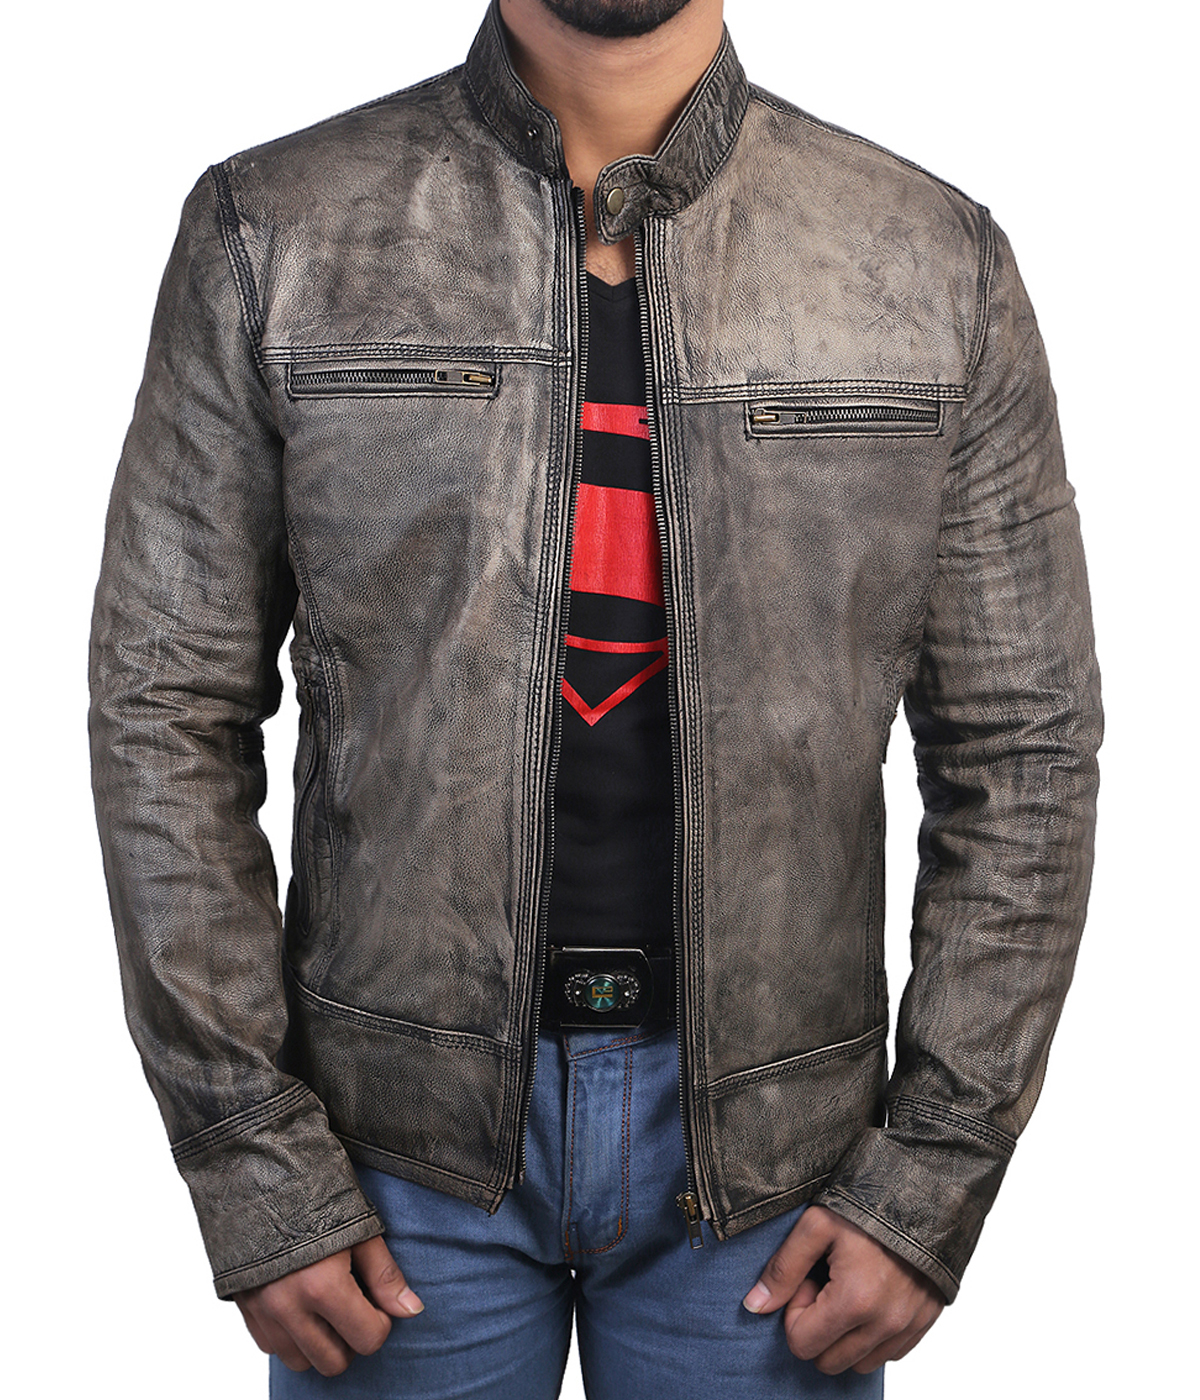 triple stitch jacket1